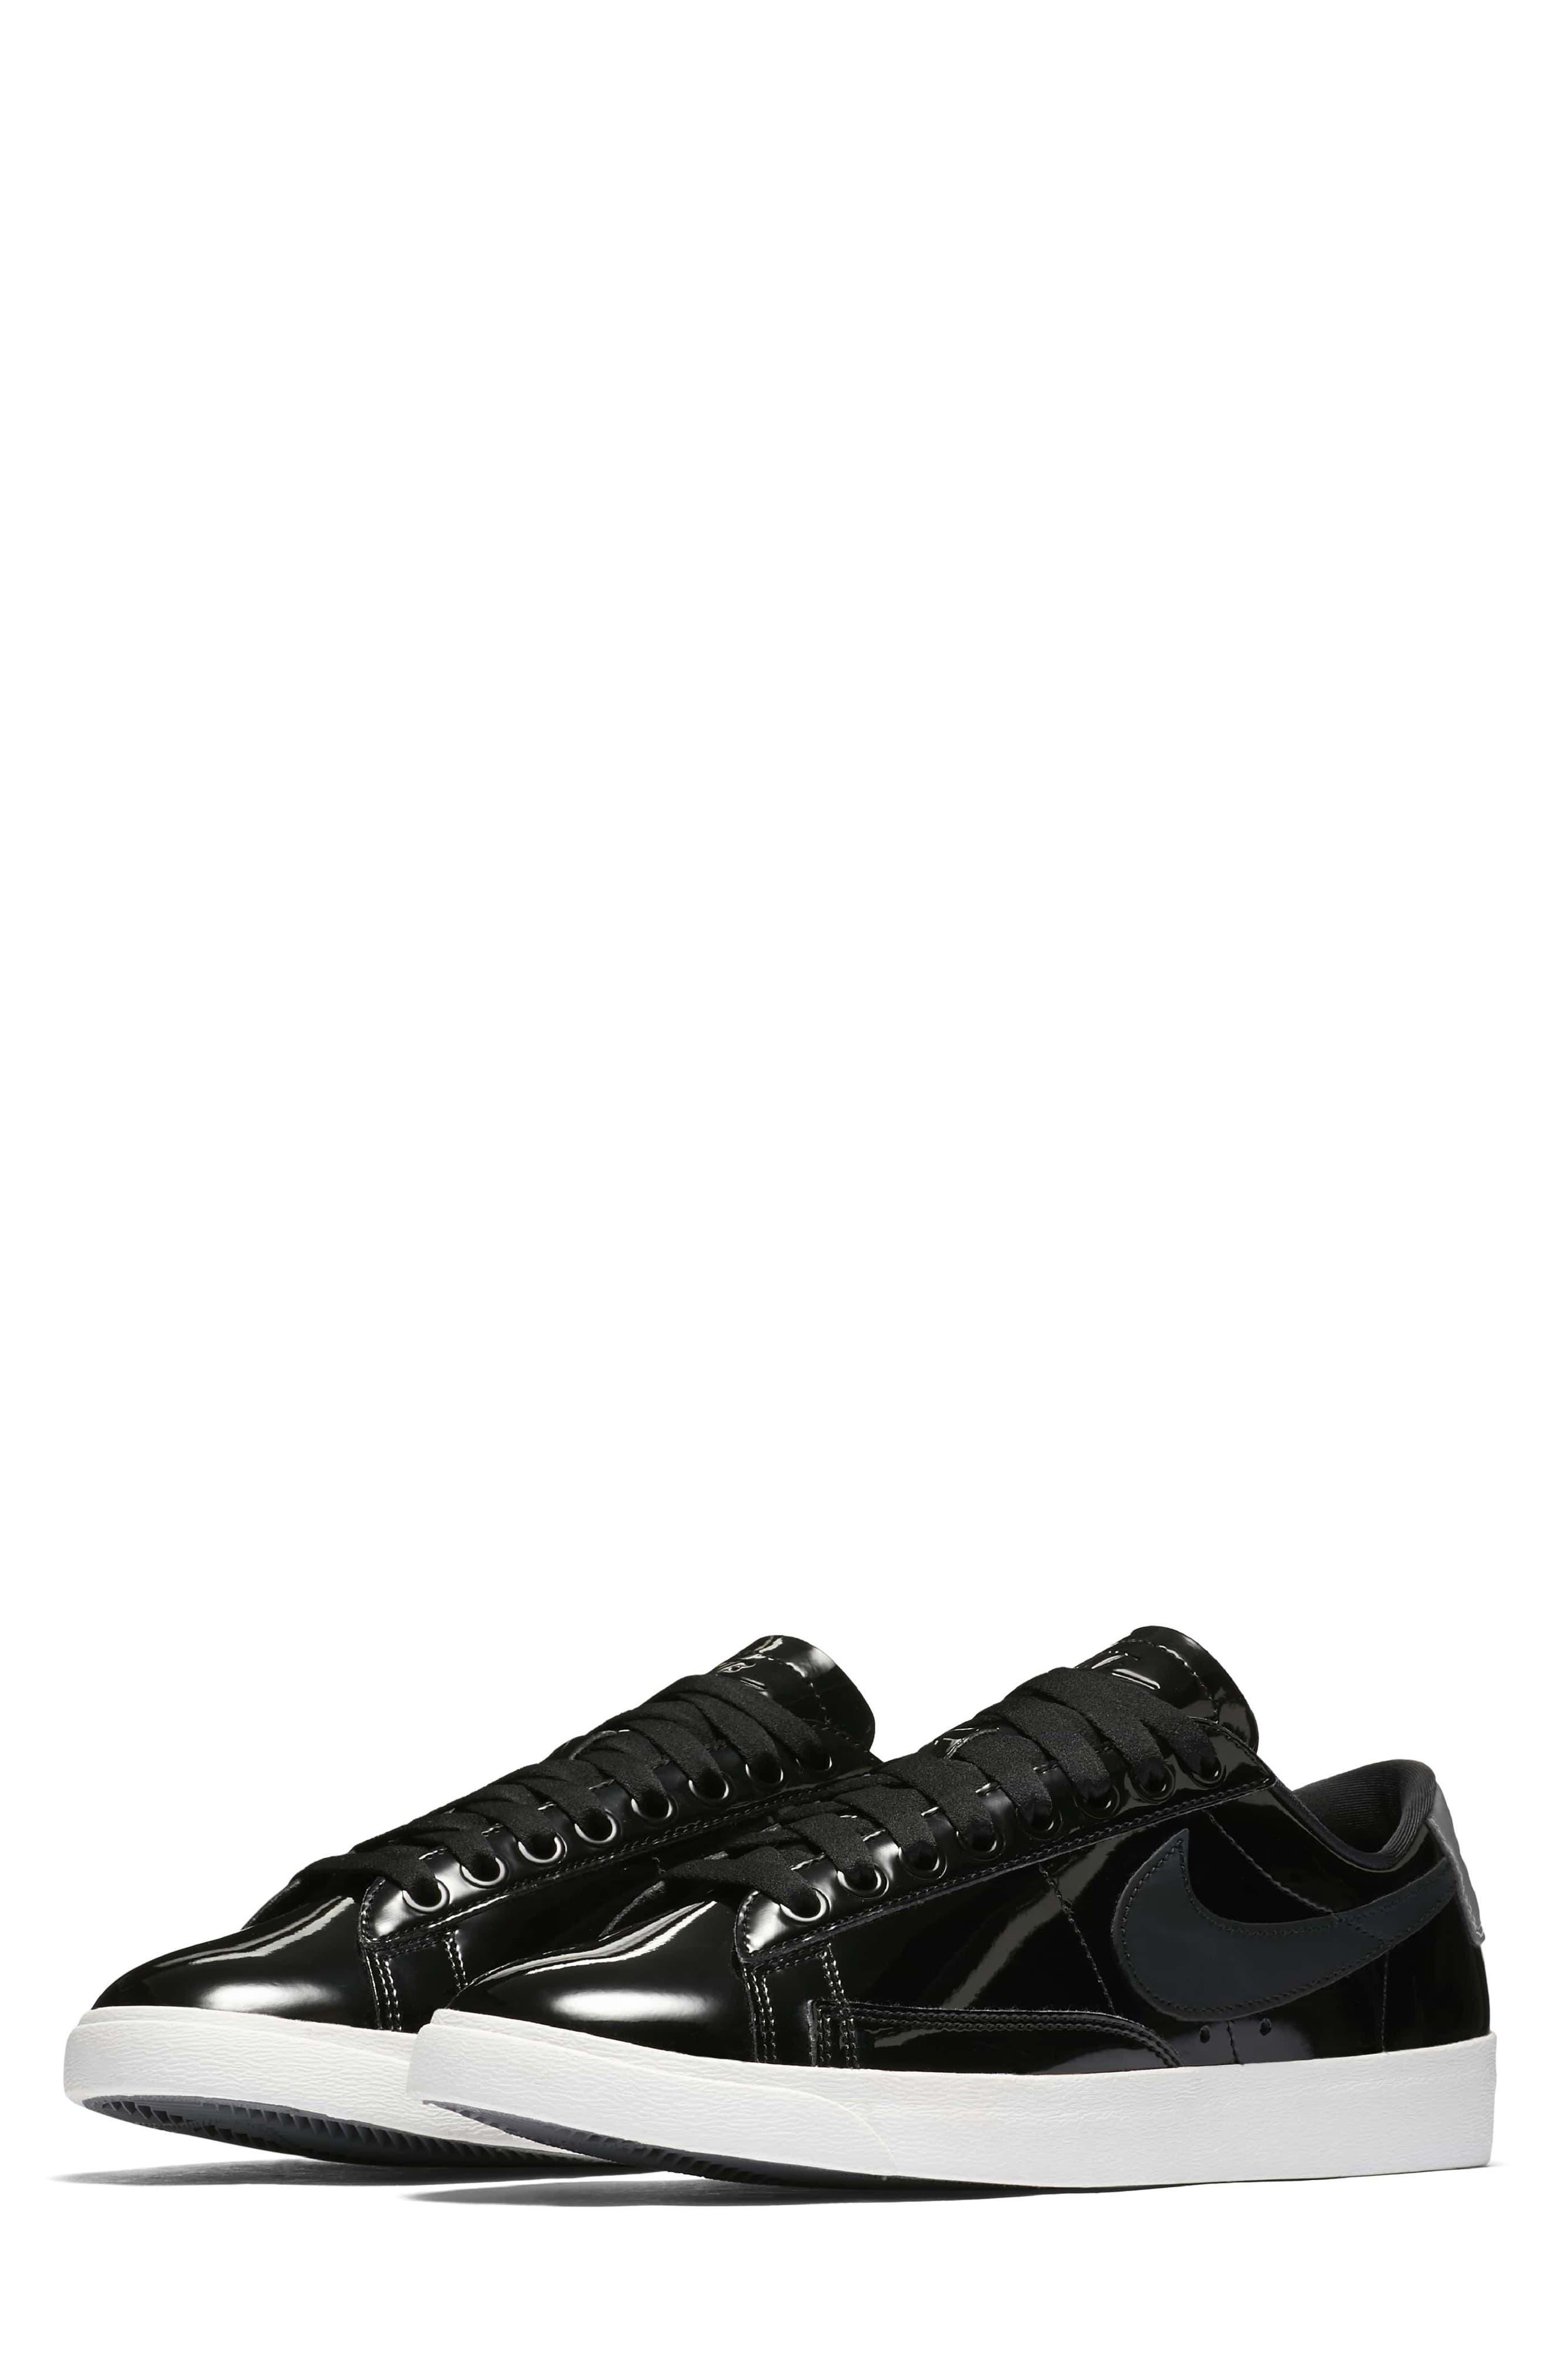 Blazer Low Top Sneaker SE,                         Main,                         color, Black/ Black Reflect Silver